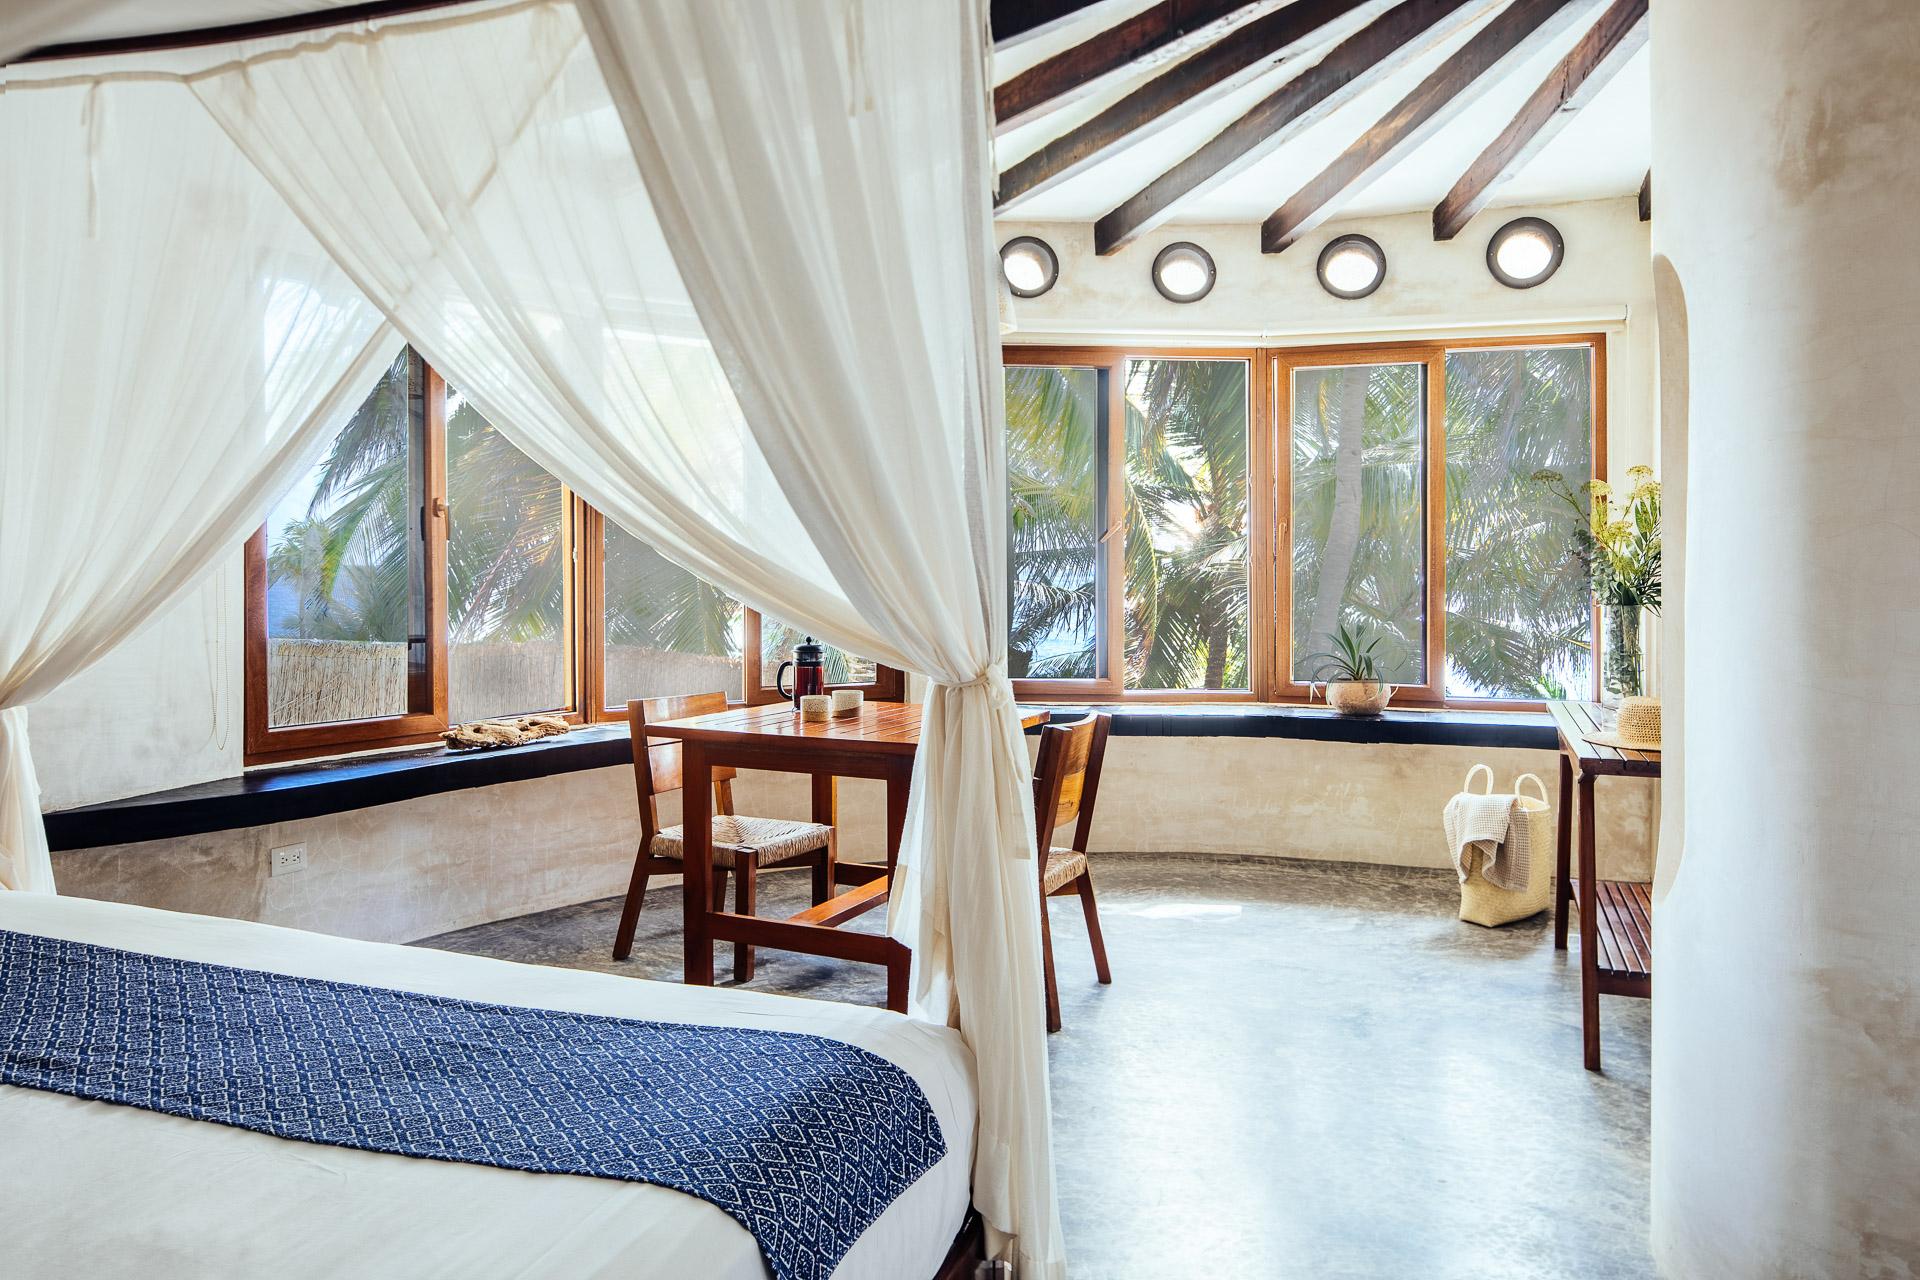 caribbean-hotel-resort-photographer-olas-tulum-mexico--15.jpg